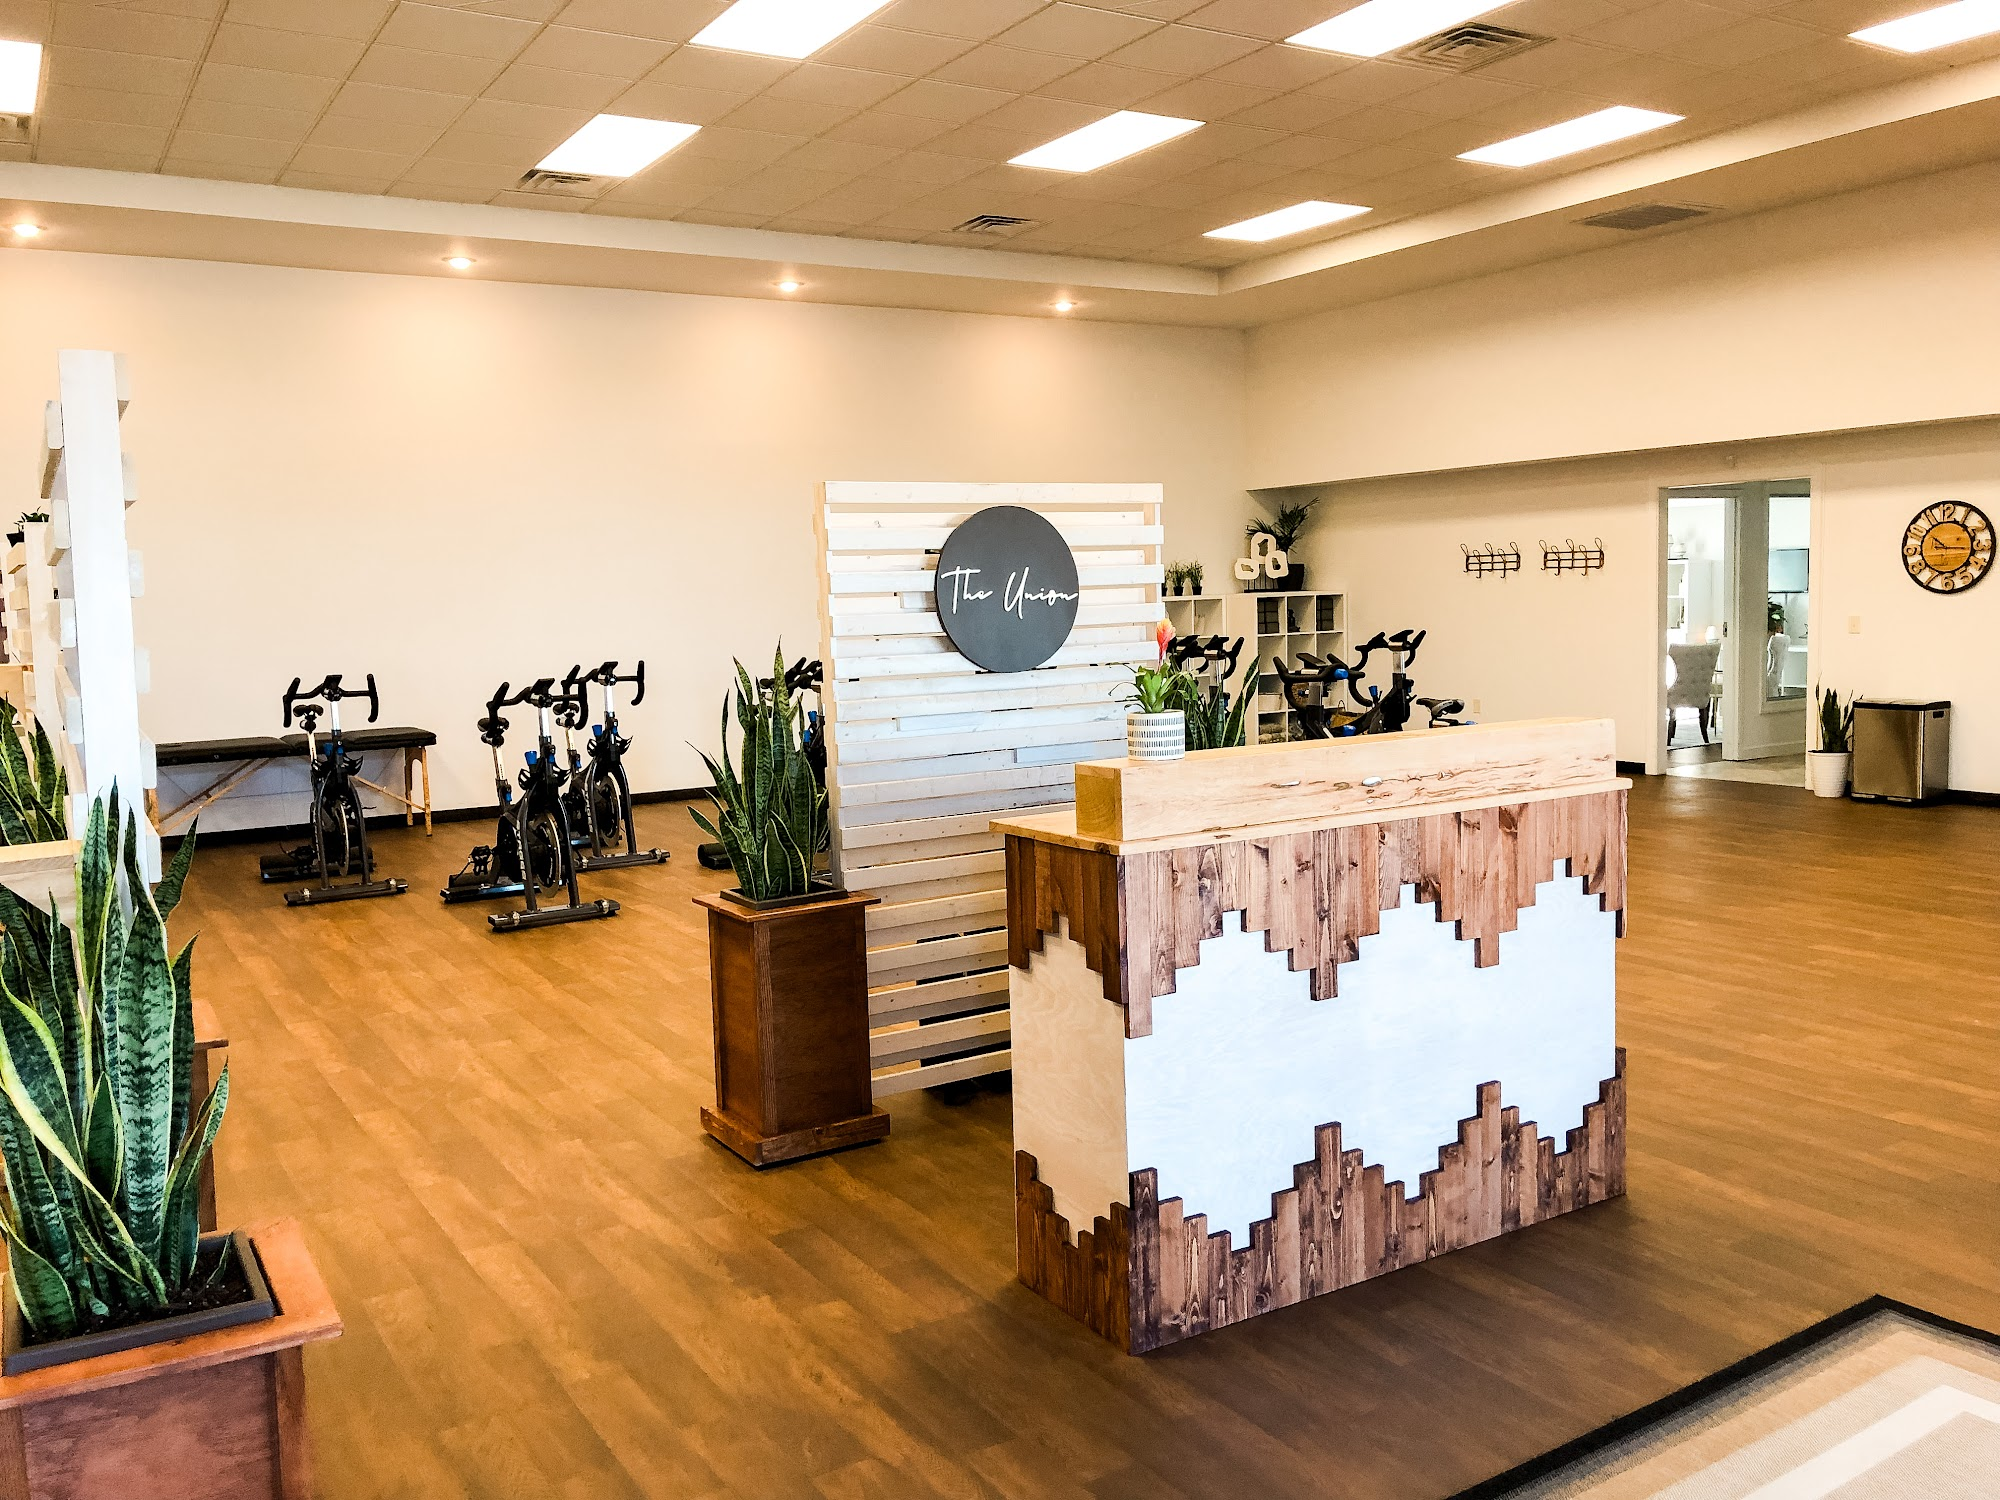 The Union, Wellness Boutique 2159 N Oak Dr Suite 2, Plymouth